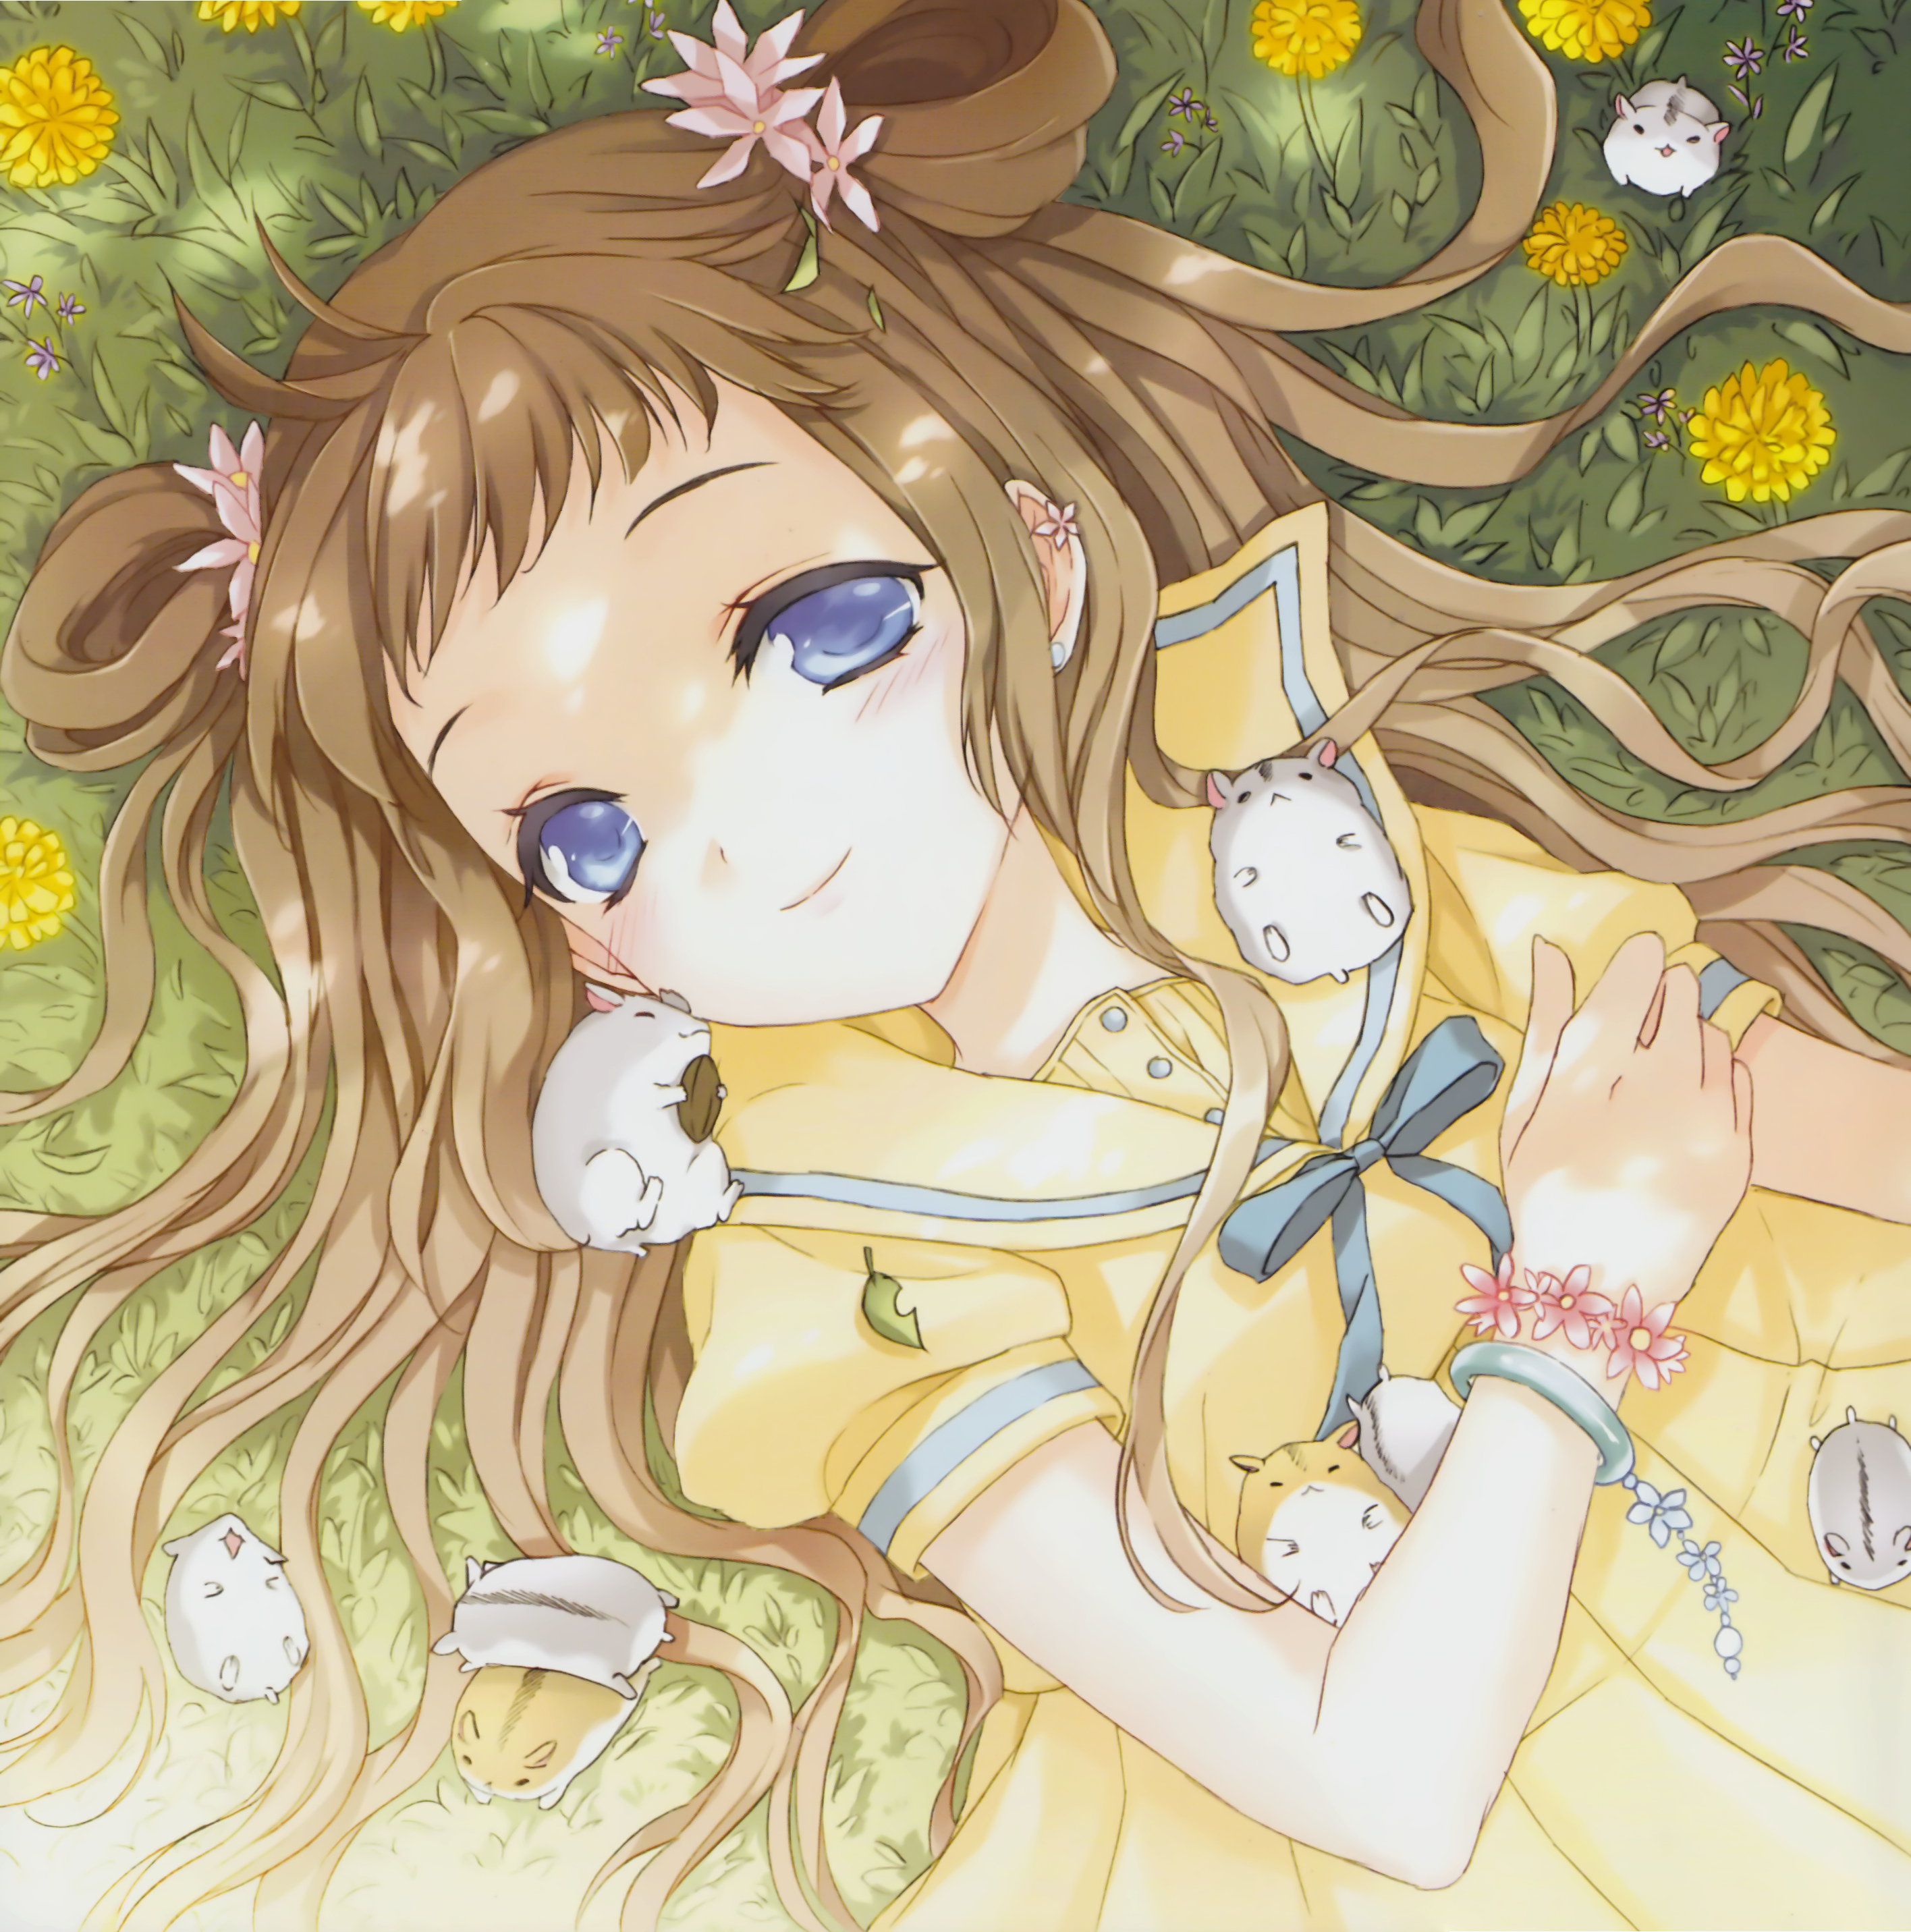 Anime Sleeping Cat Girl Sketch